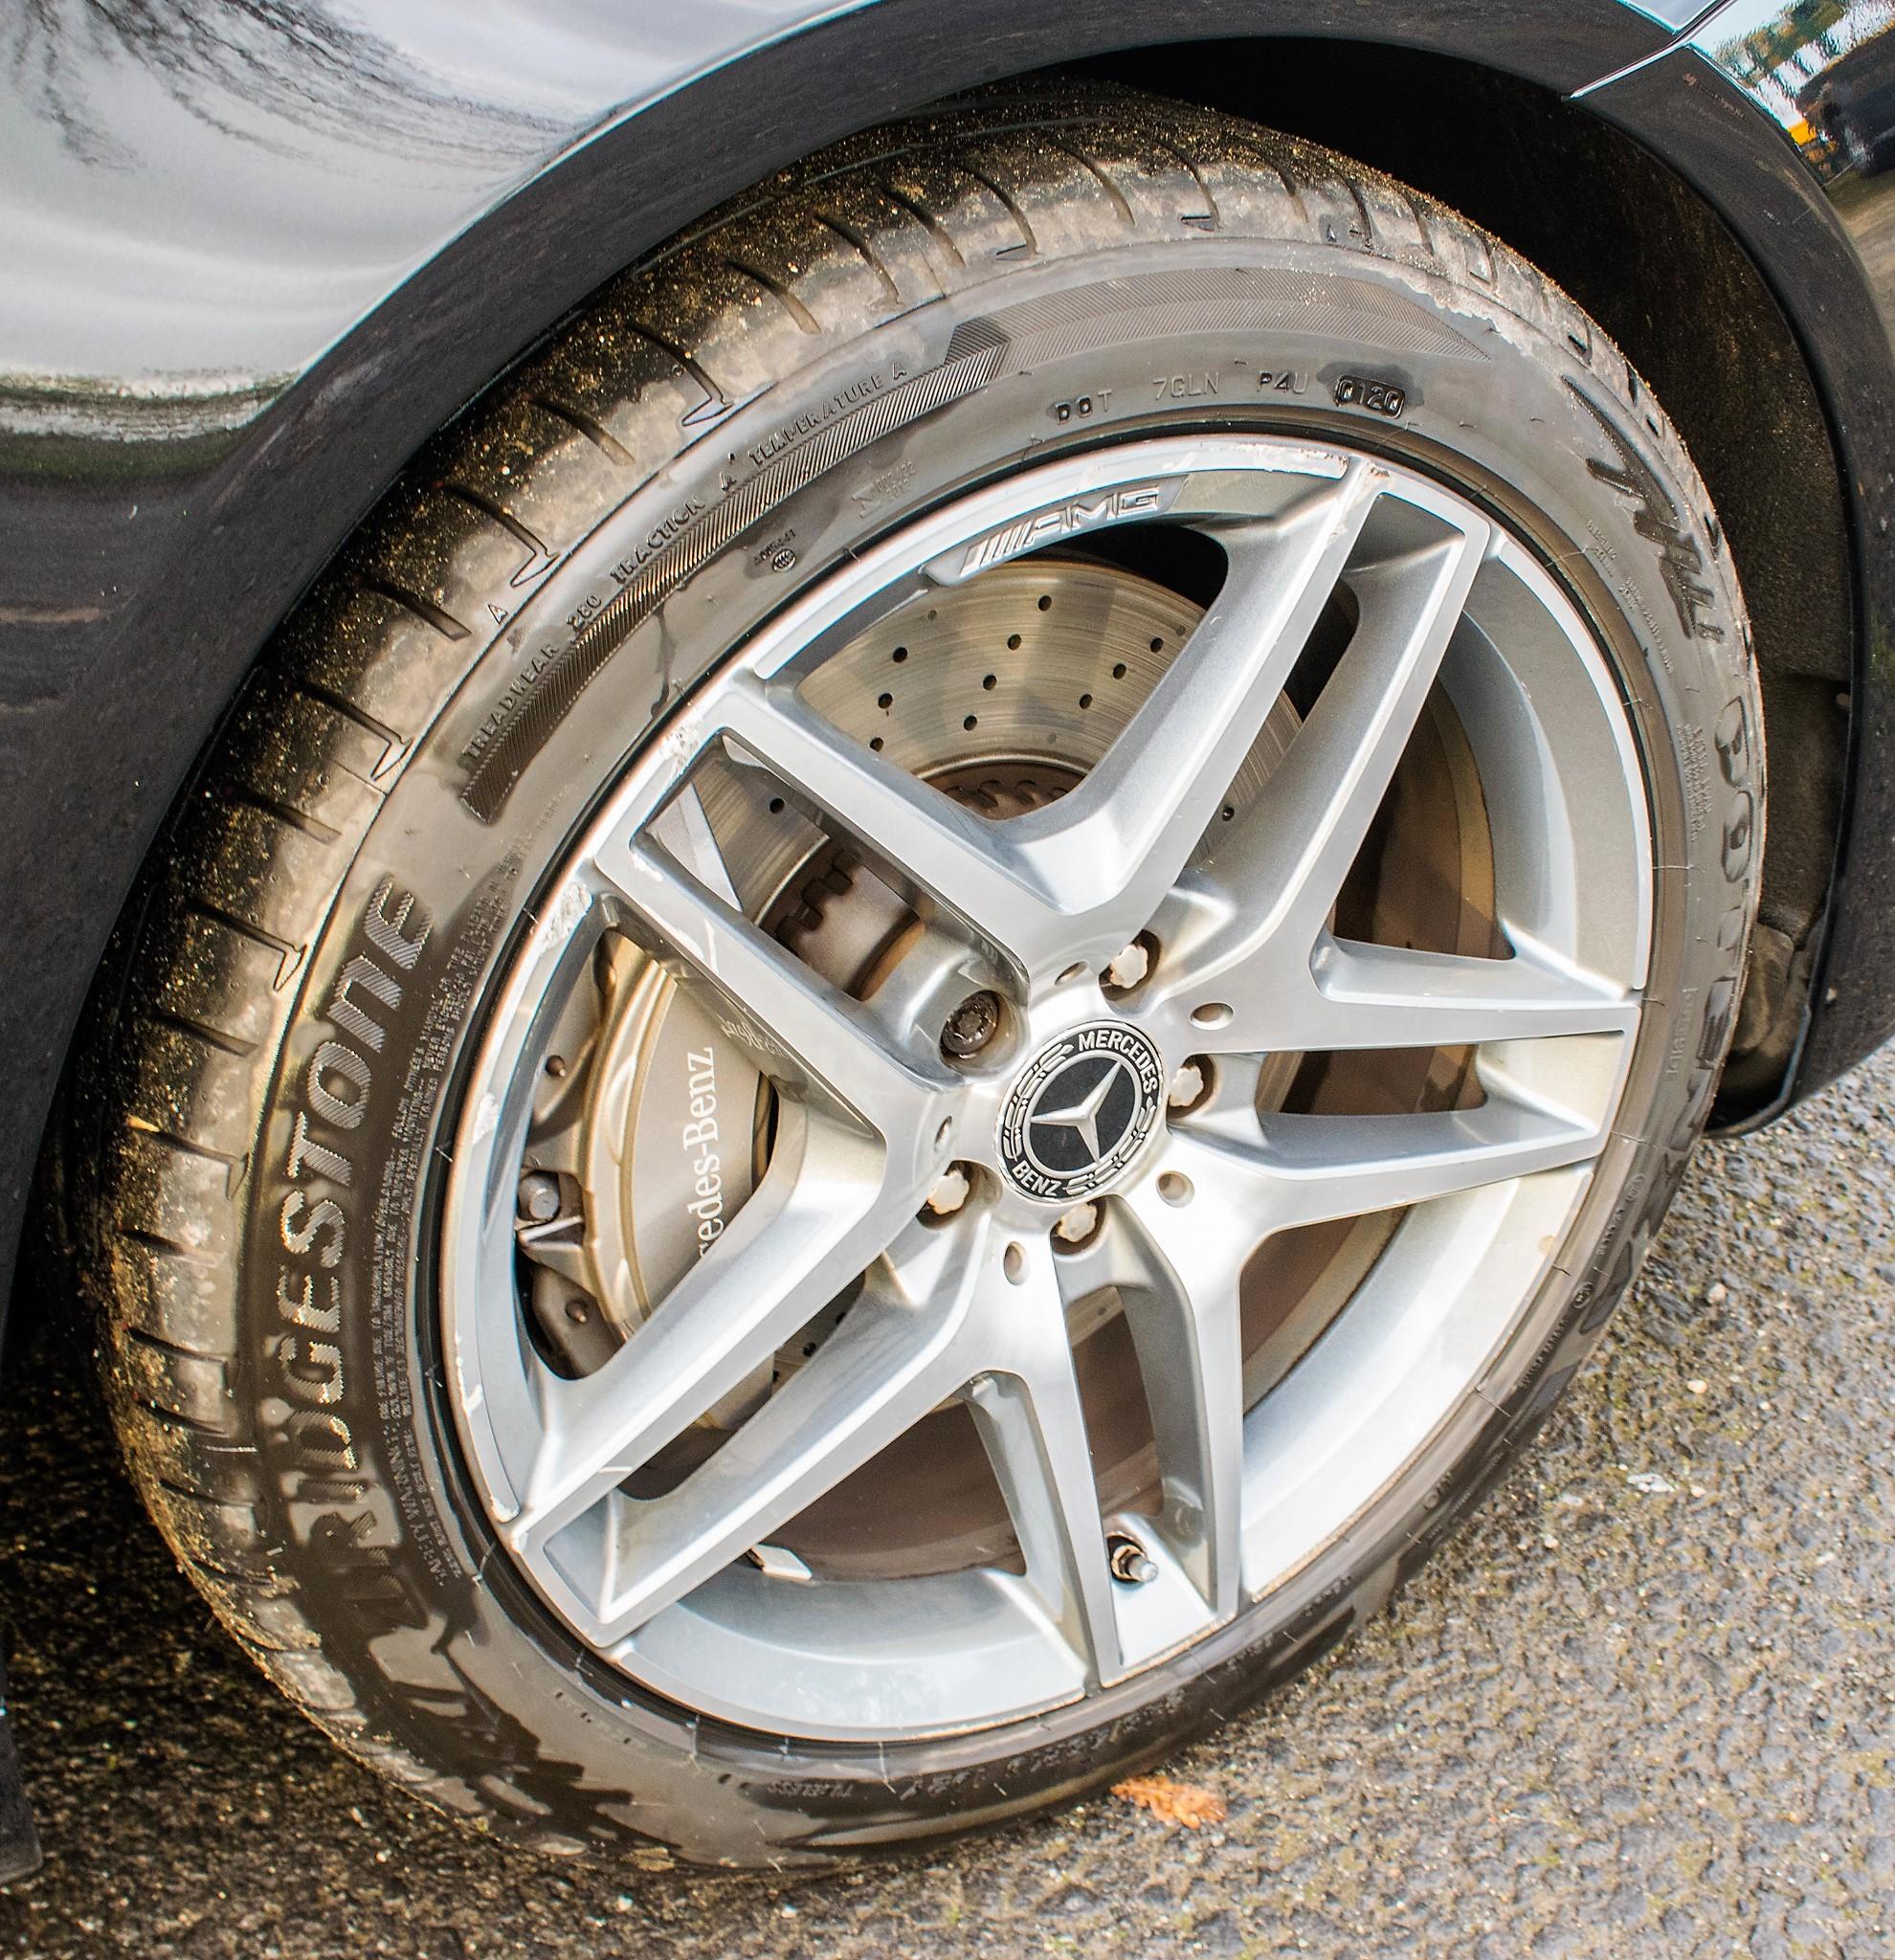 Mercedes Benz S450 L AMG Line Executive auto petrol 4 door saloon car Registration Number: FX68 - Image 16 of 33